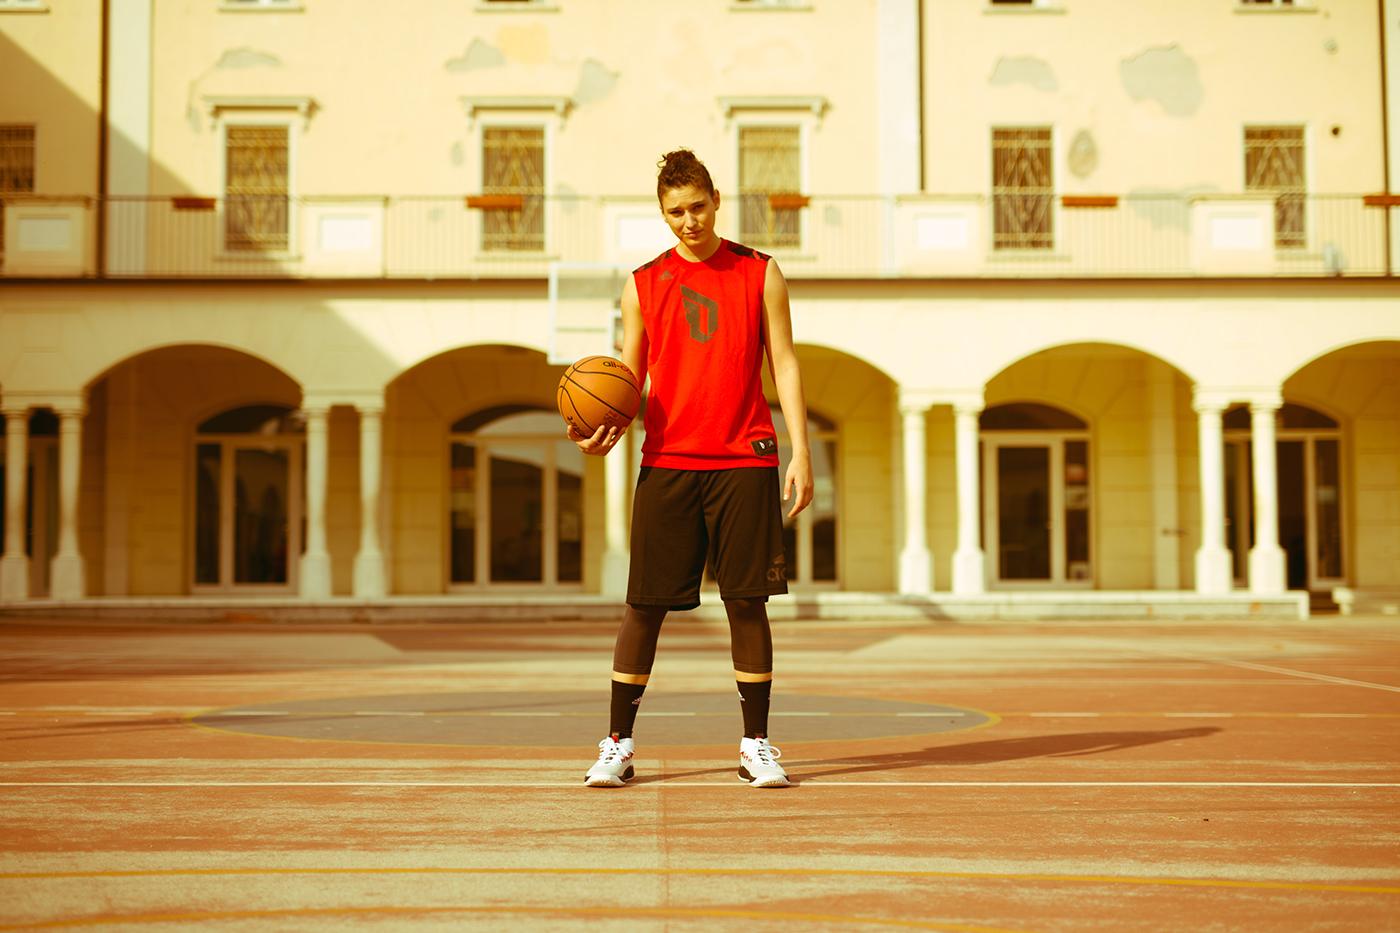 basket basketball NBA adidas Lillard sport game training court Basketballcourt